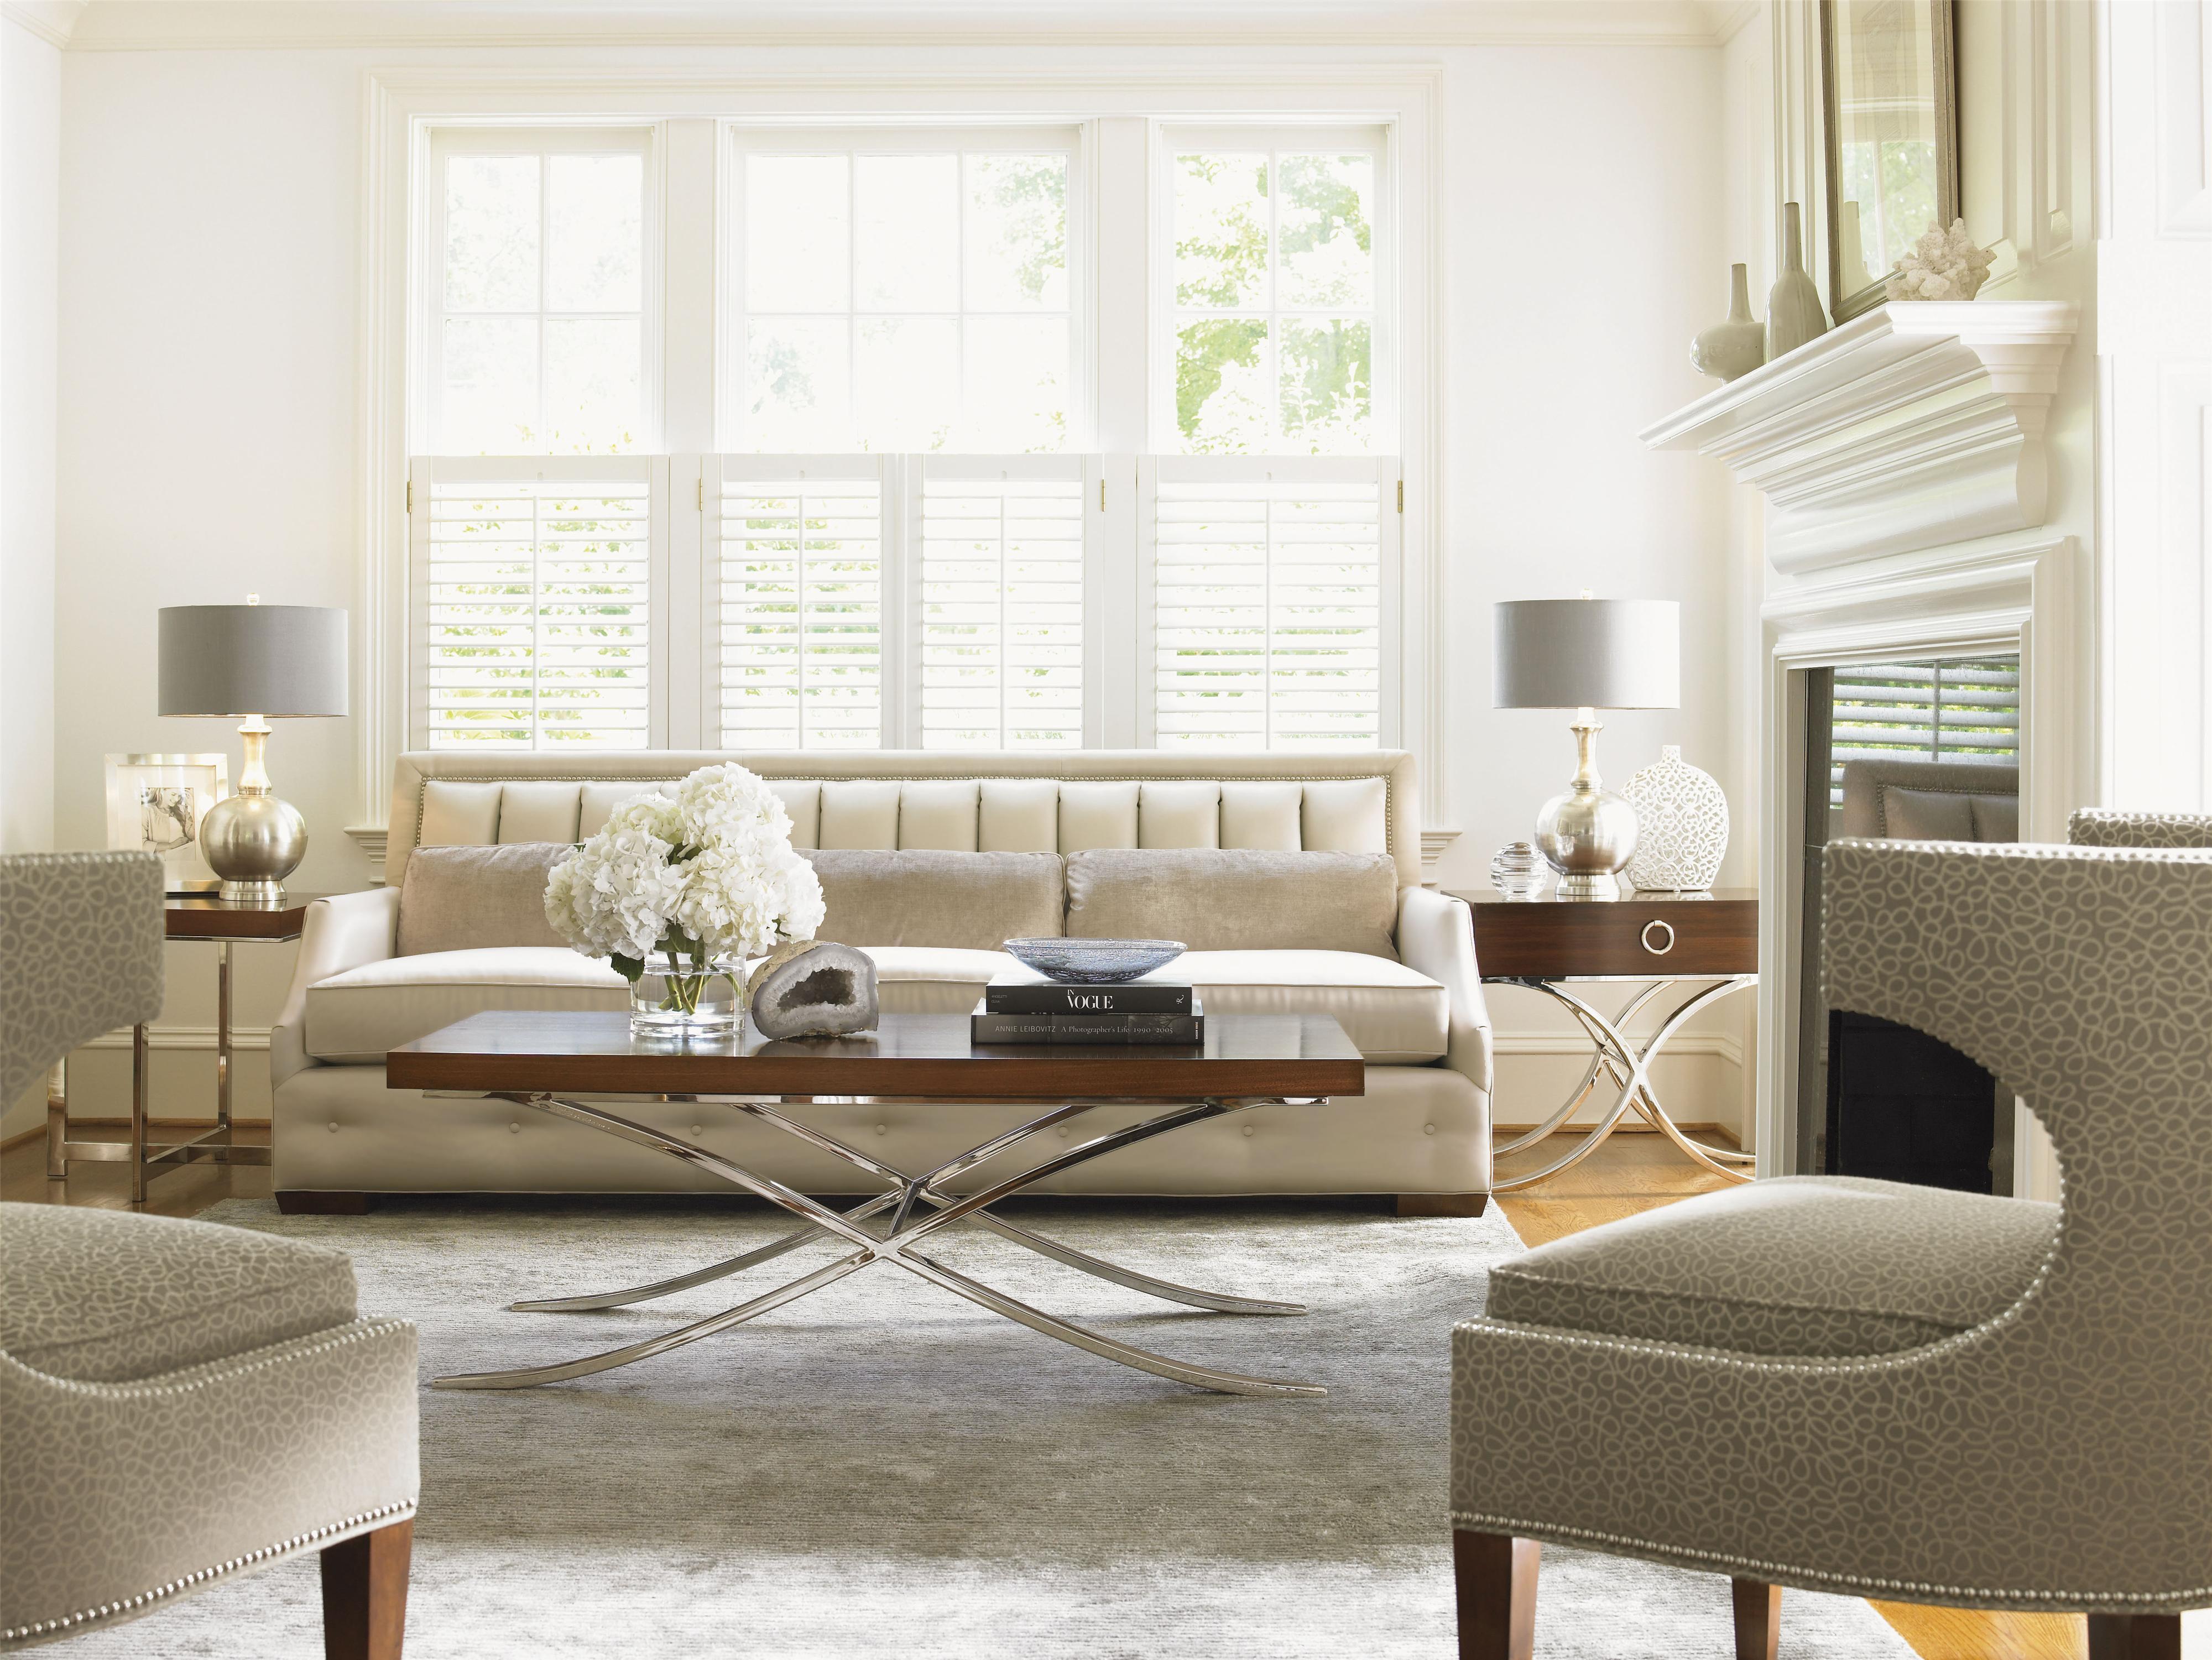 Mirage Stationary Living Room Group by Lexington at Furniture Fair - North Carolina